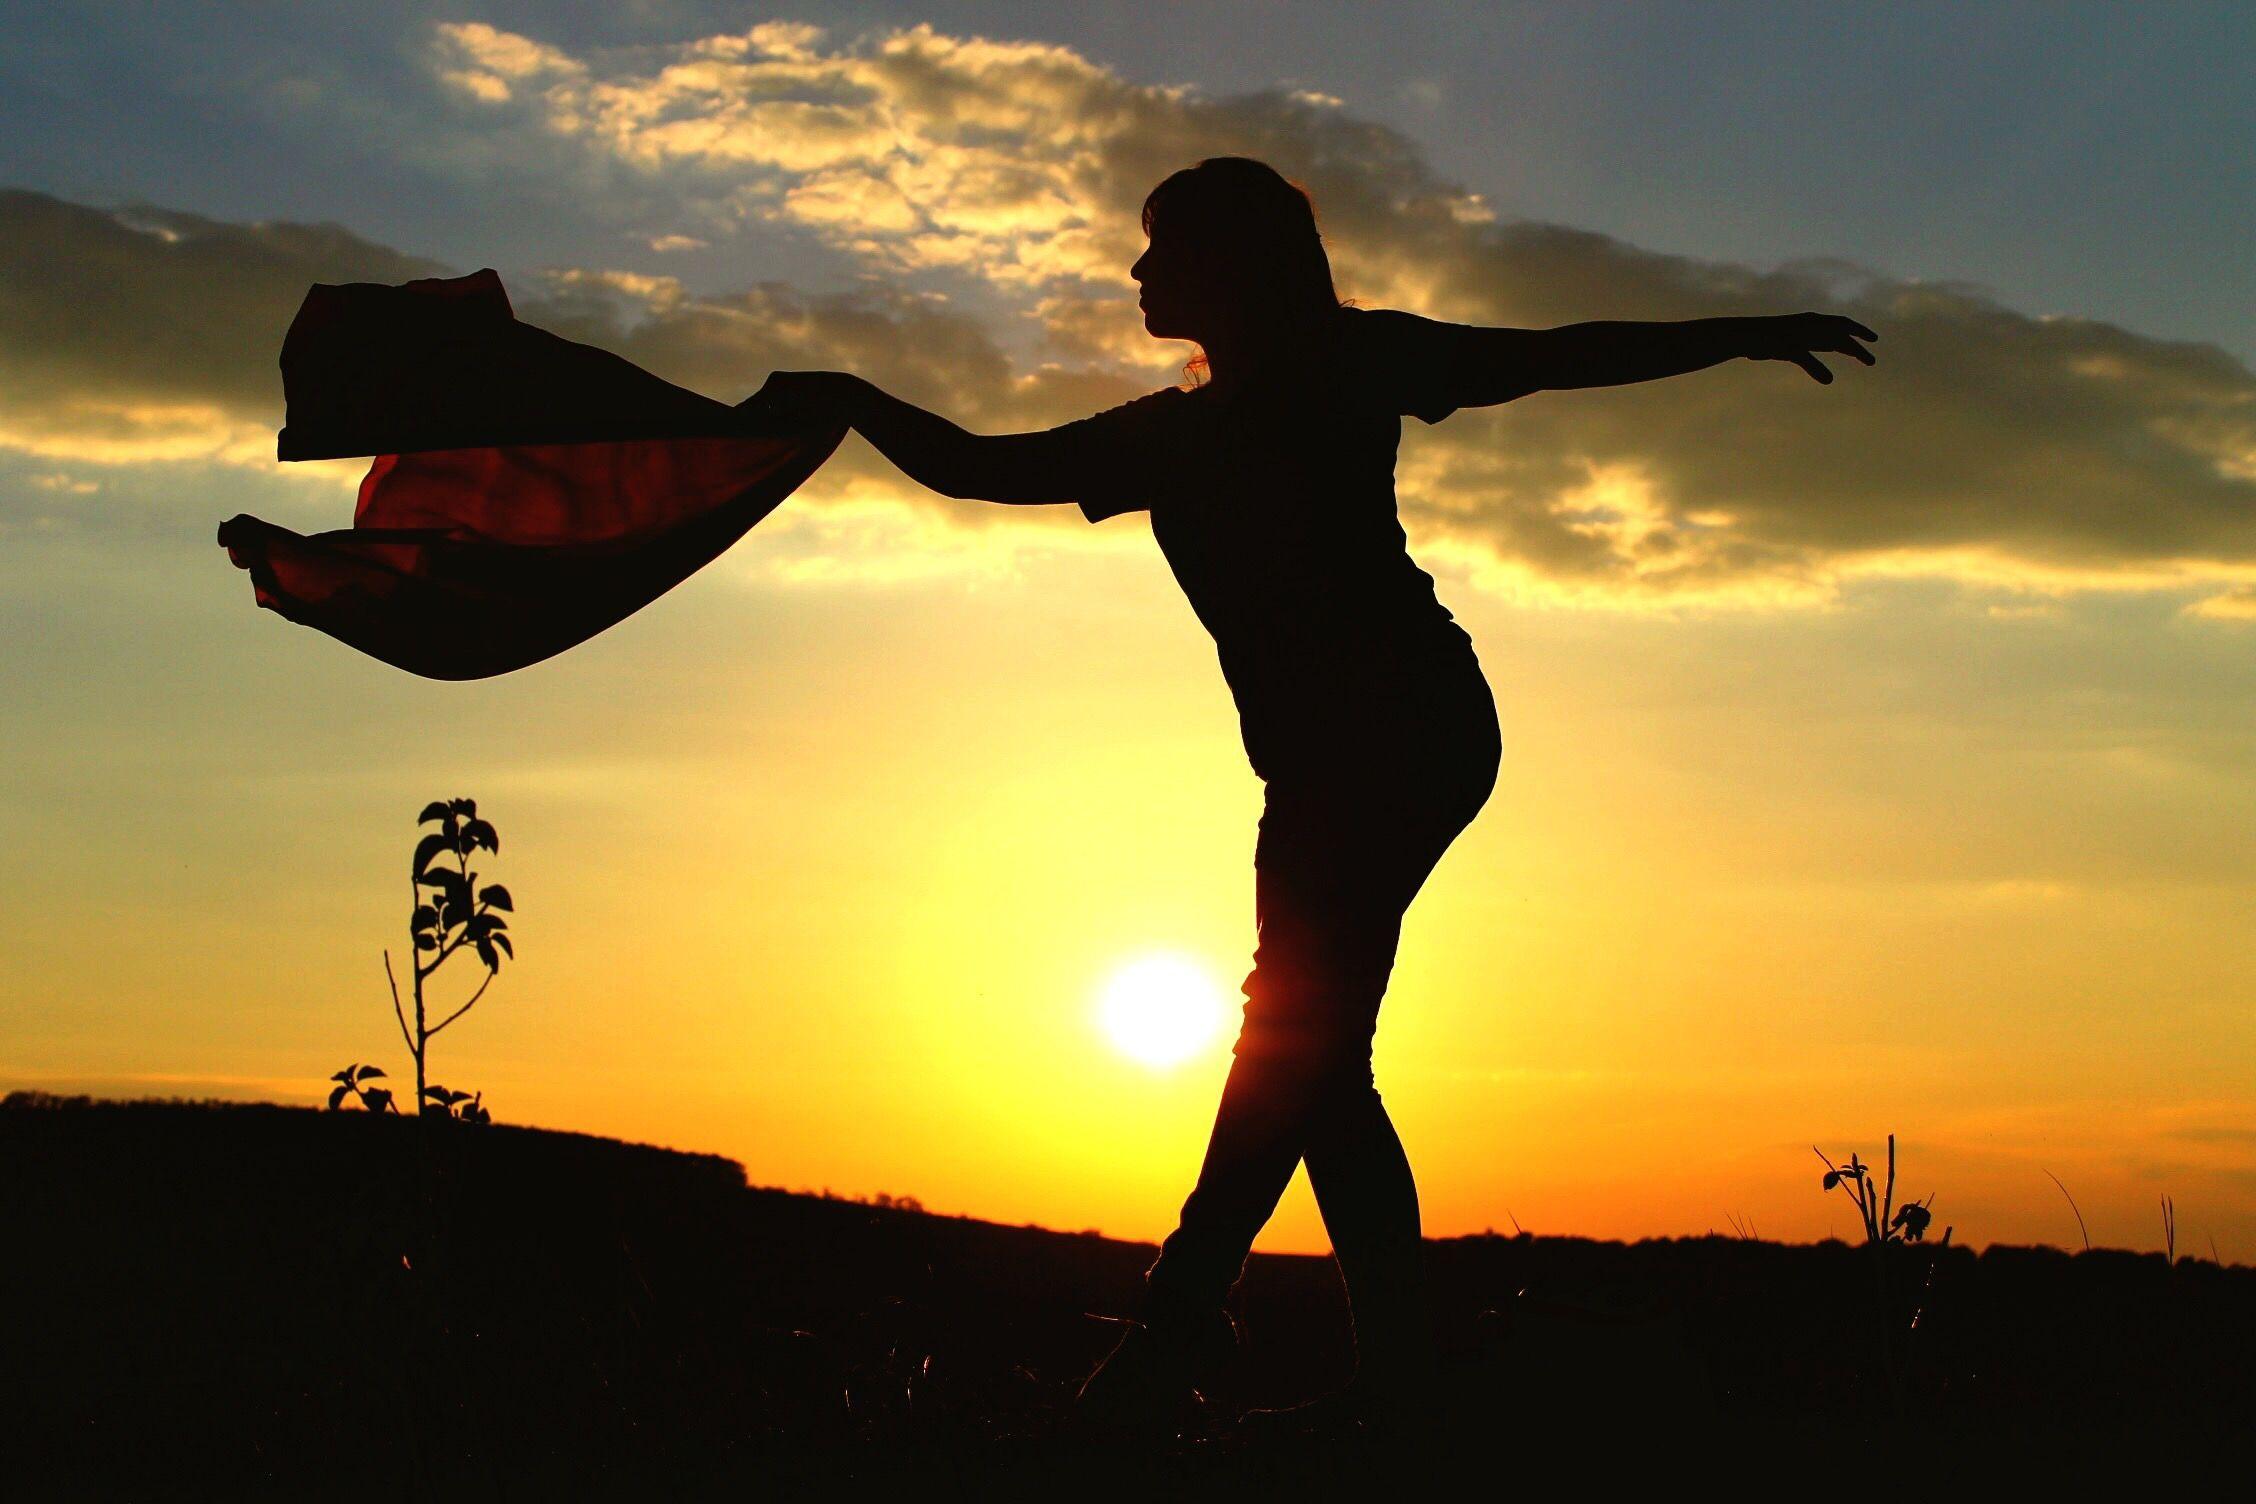 Praise Dance: Liturgical Dance as a Form of Worship